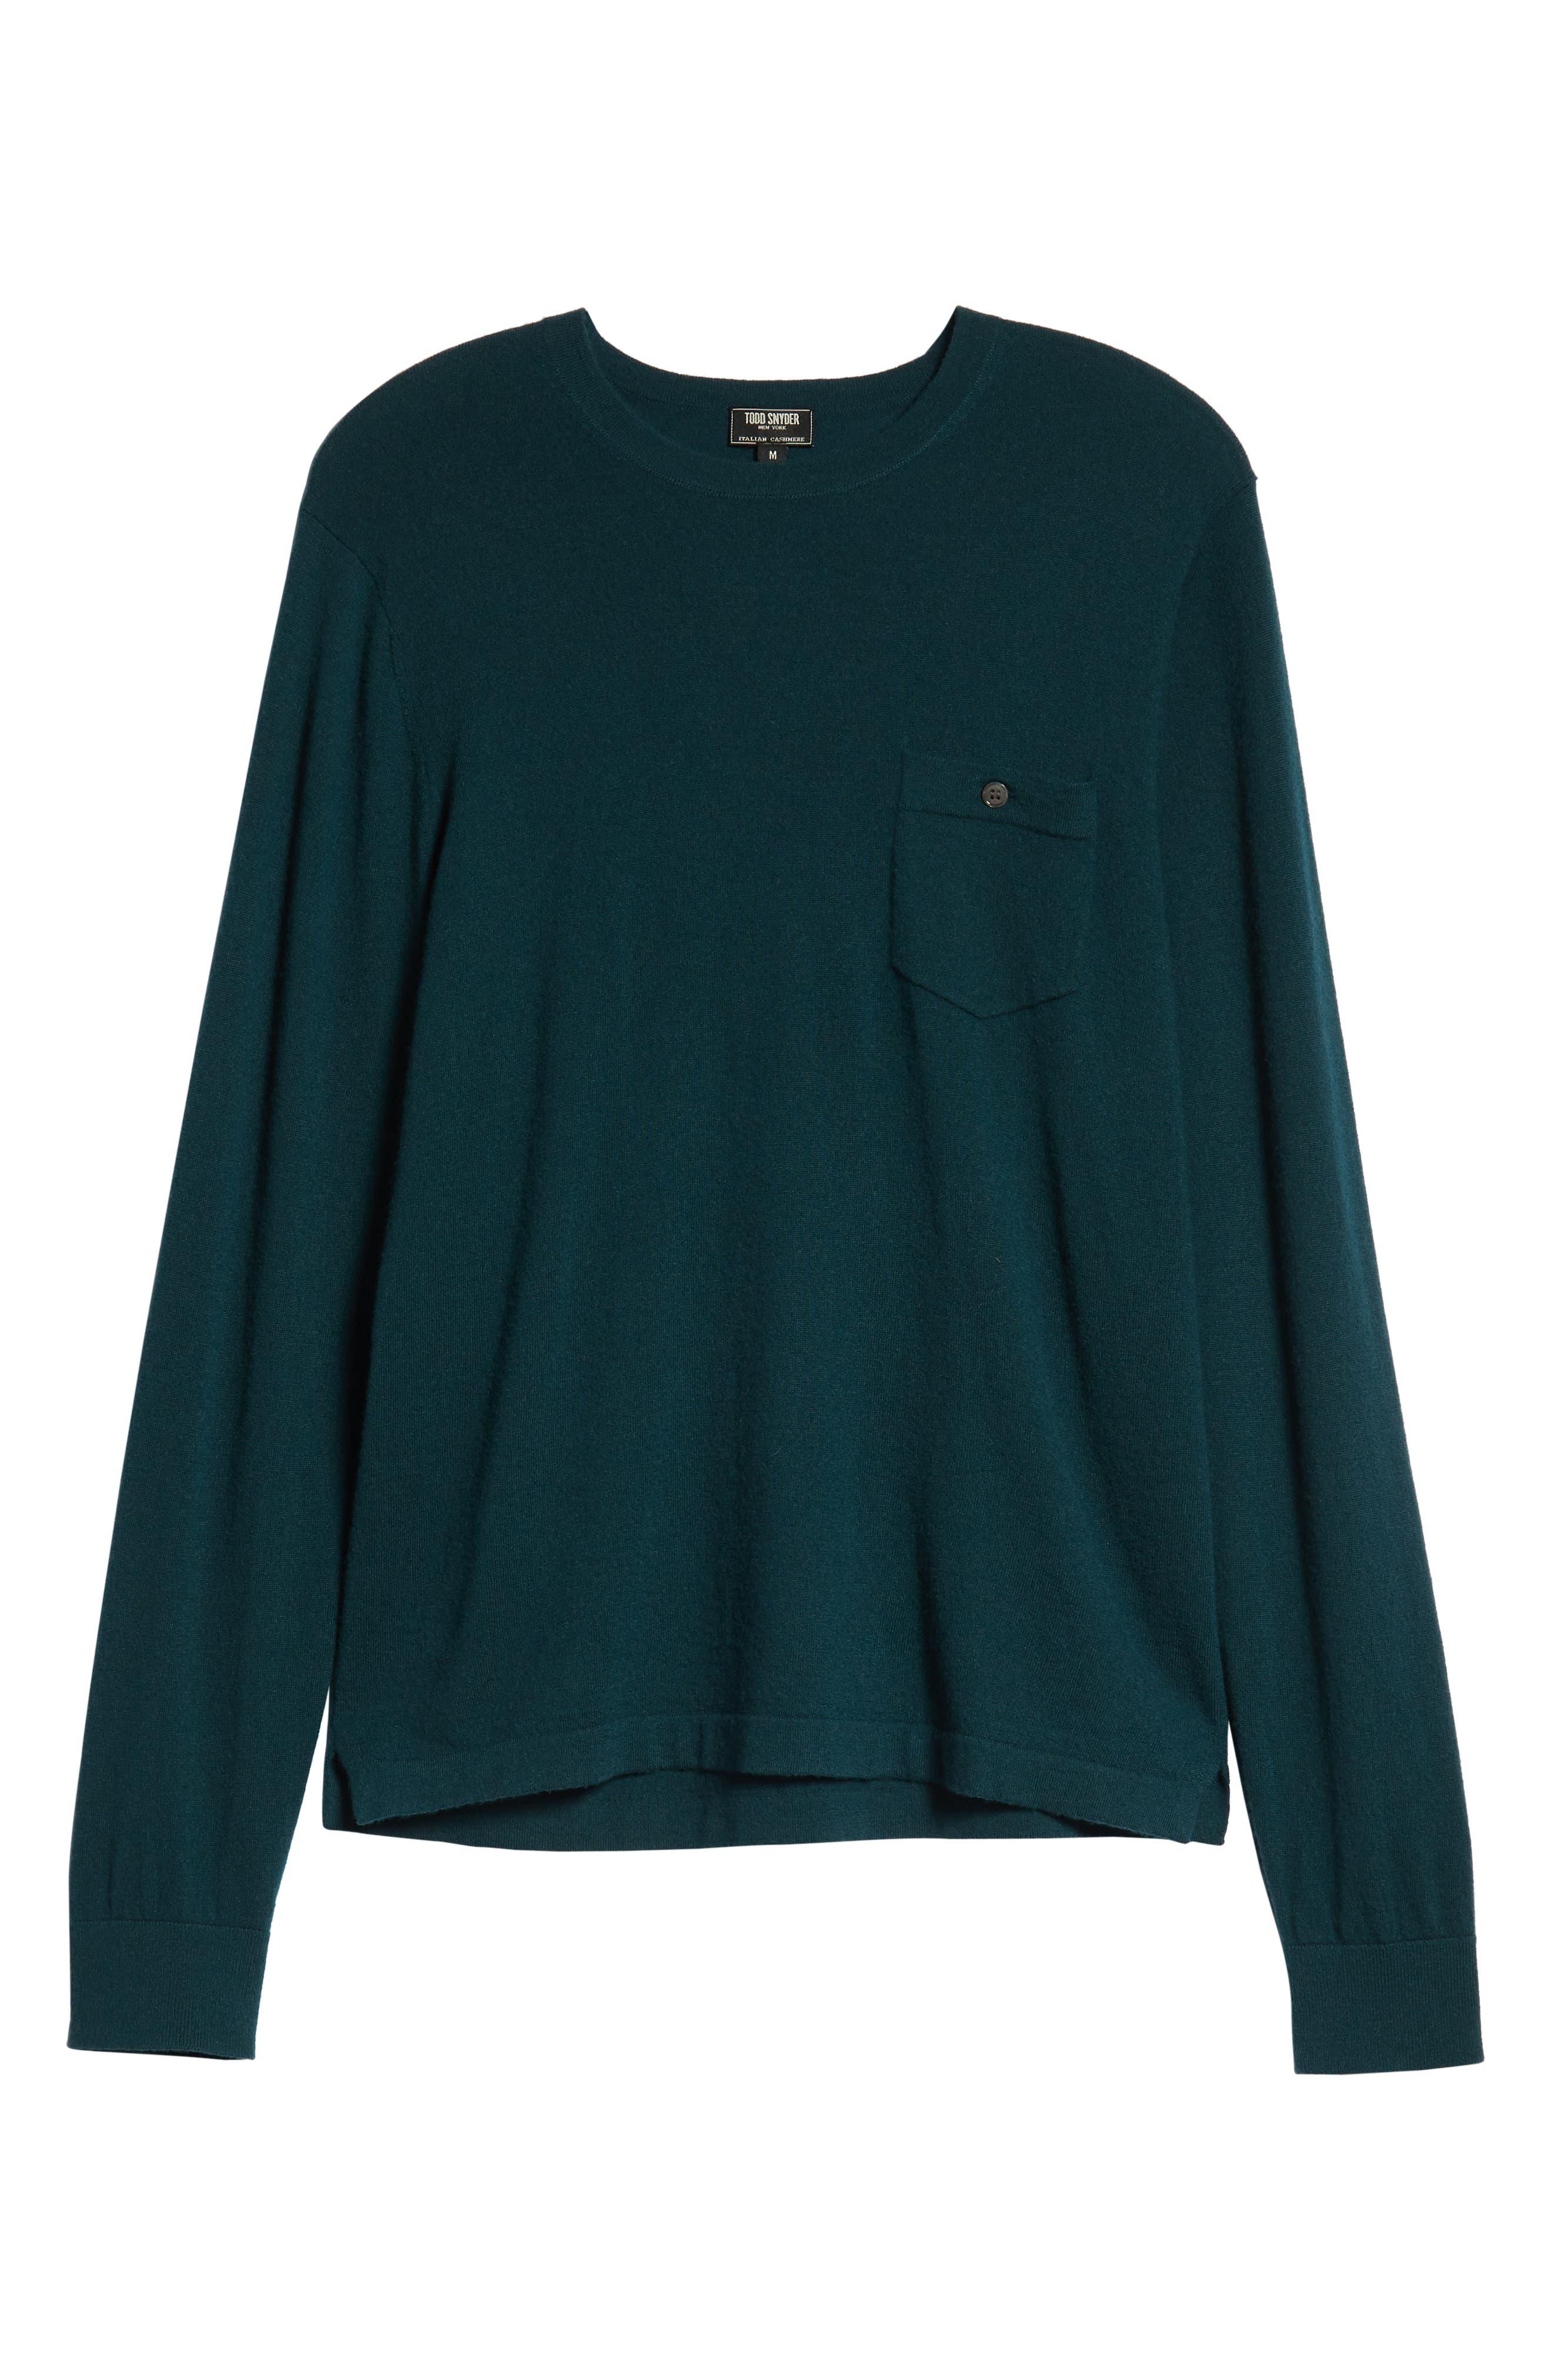 Cashmere Sweater,                             Alternate thumbnail 6, color,                             PETROL